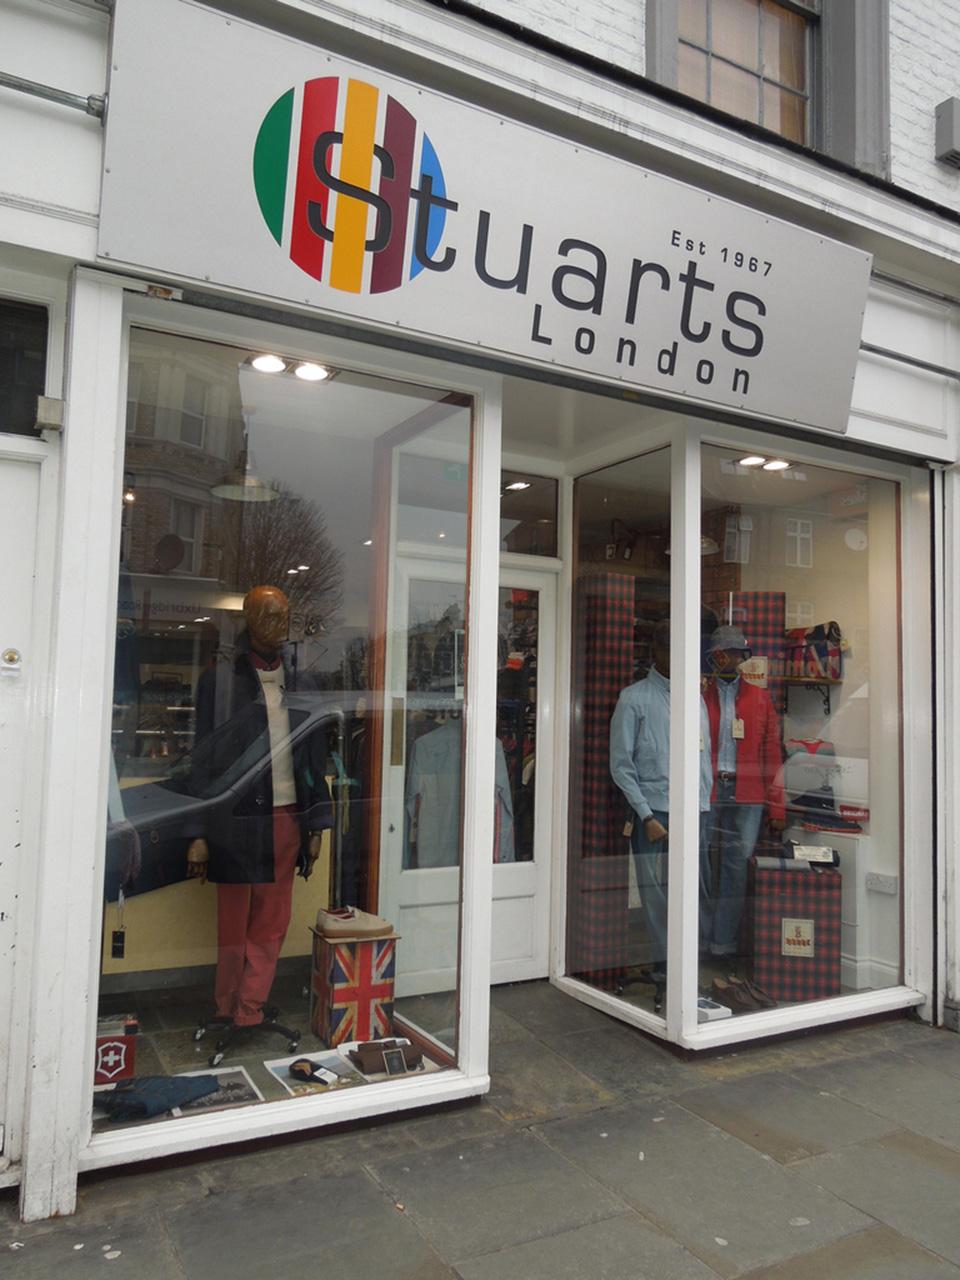 Fachadas de Lojas de Roupas Masculinas Stuarts London